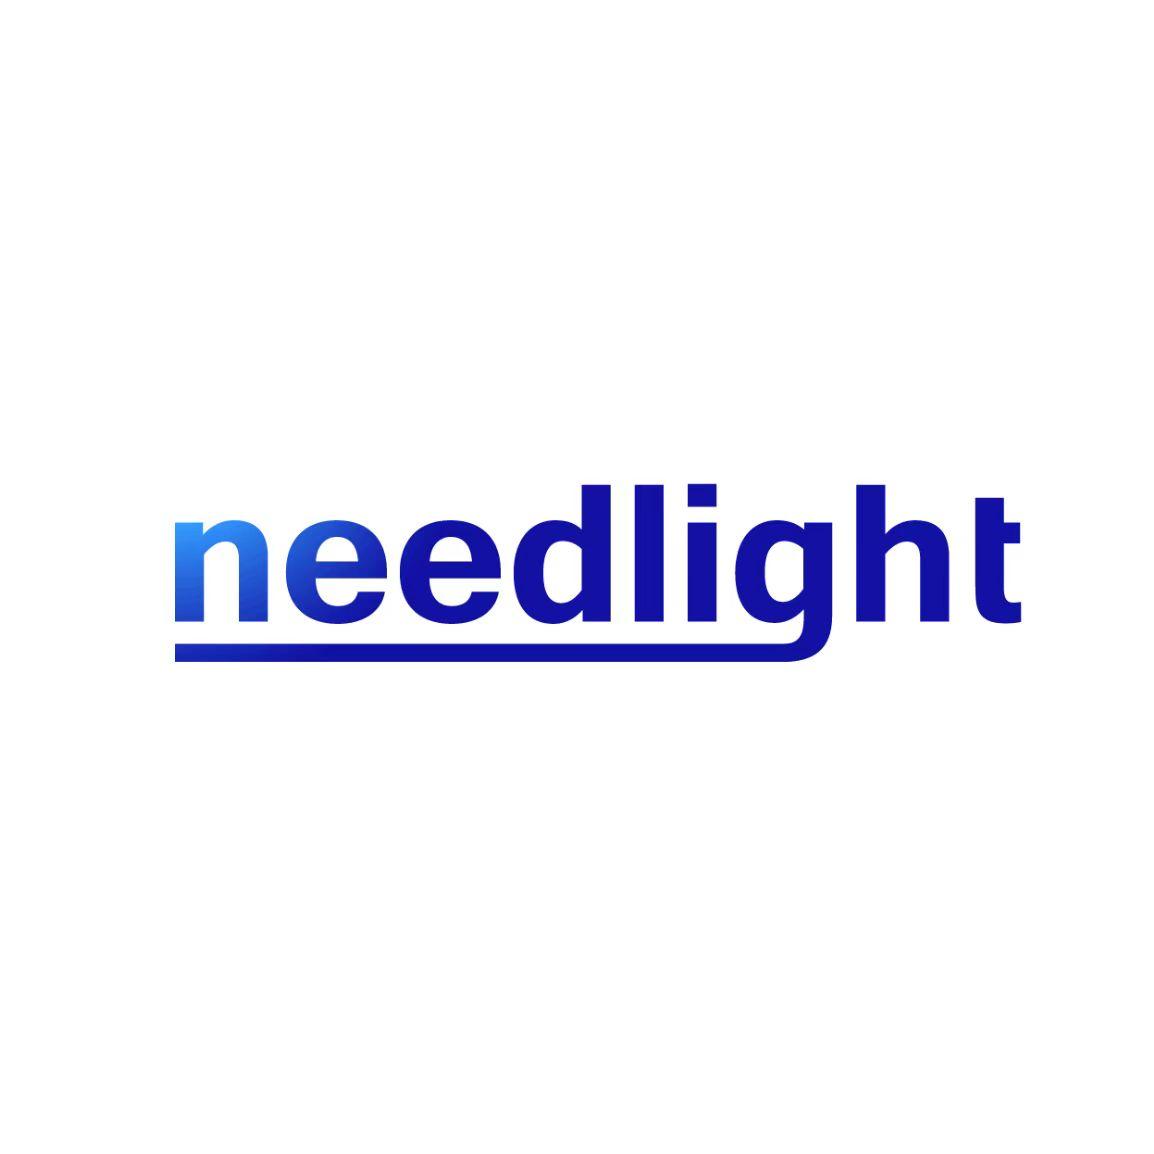 兆赞     needlight